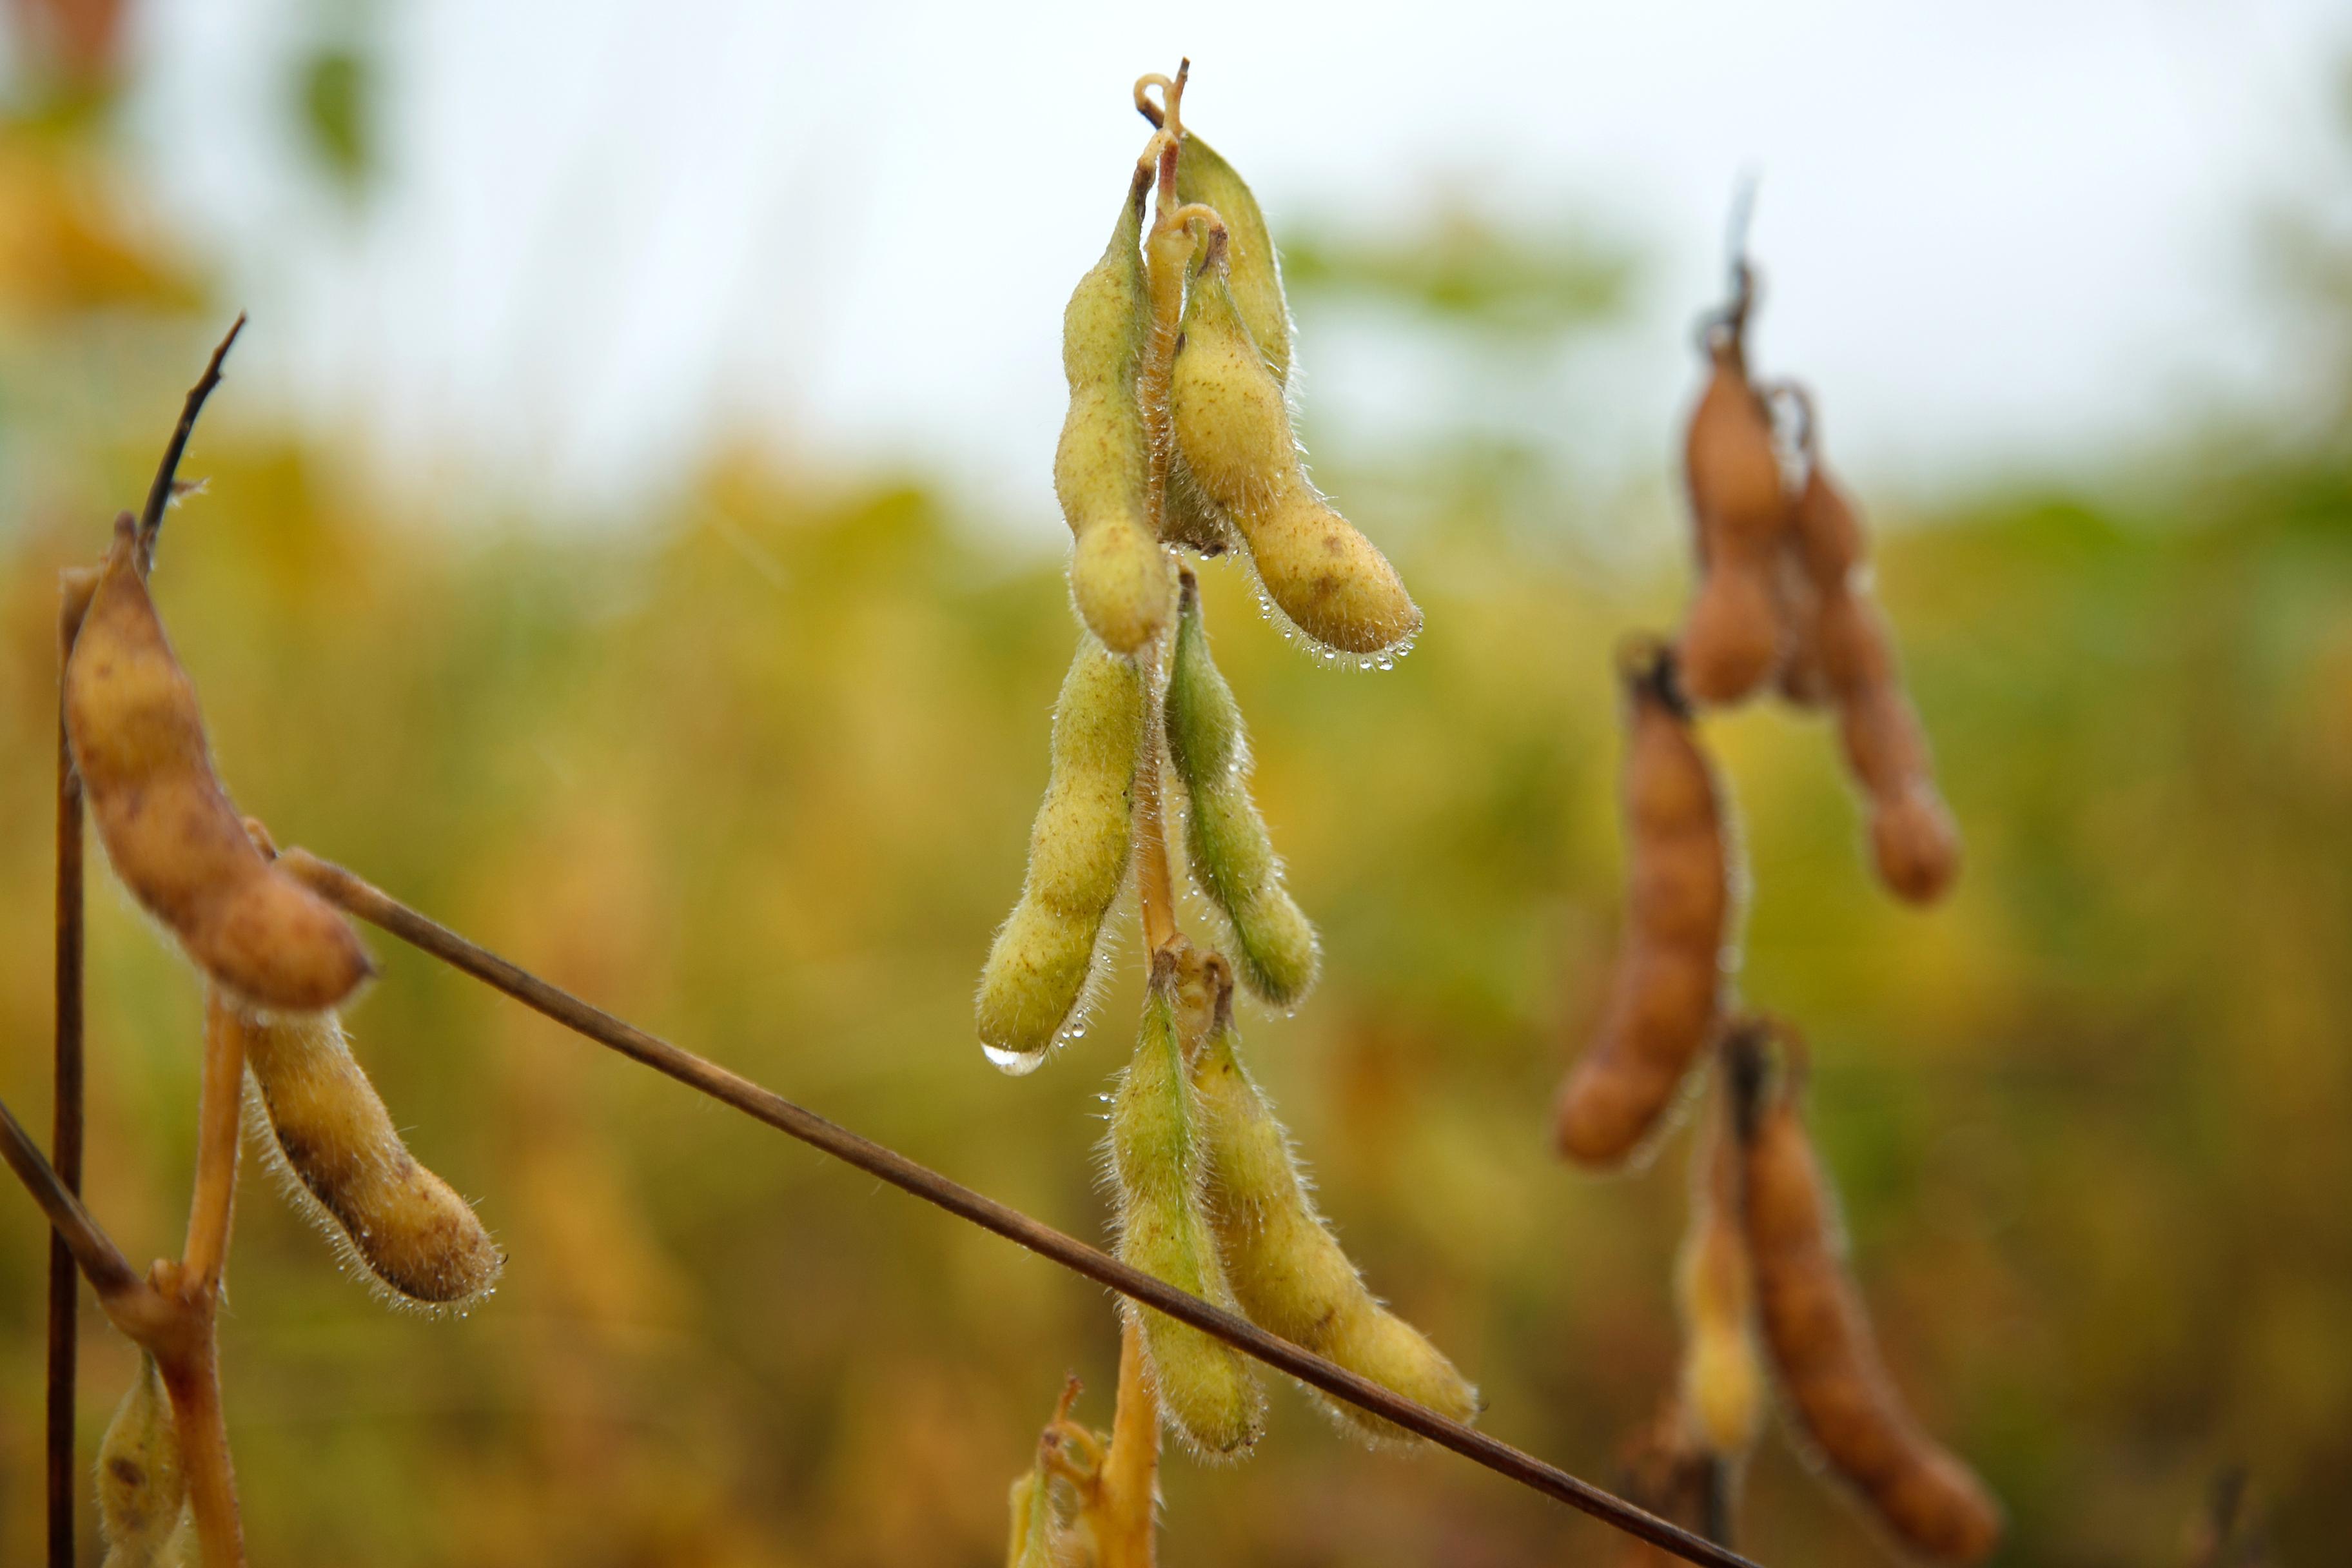 Wet season extends harvest